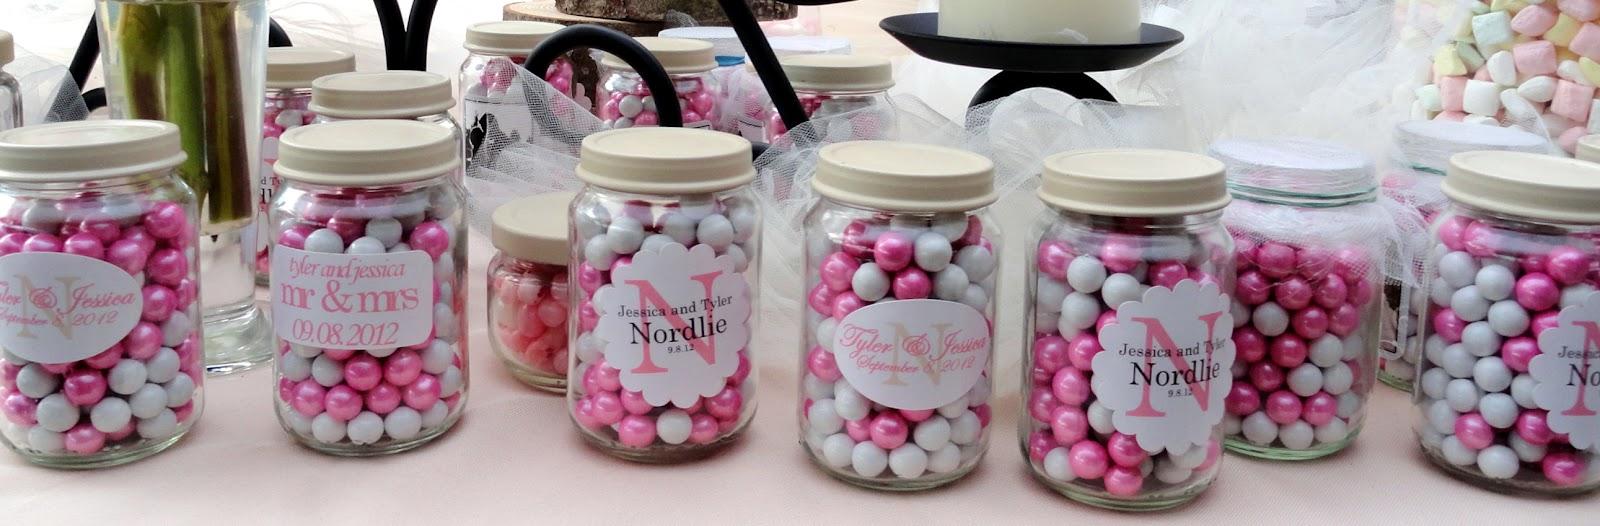 Wedding Favors Using Baby Food Jars